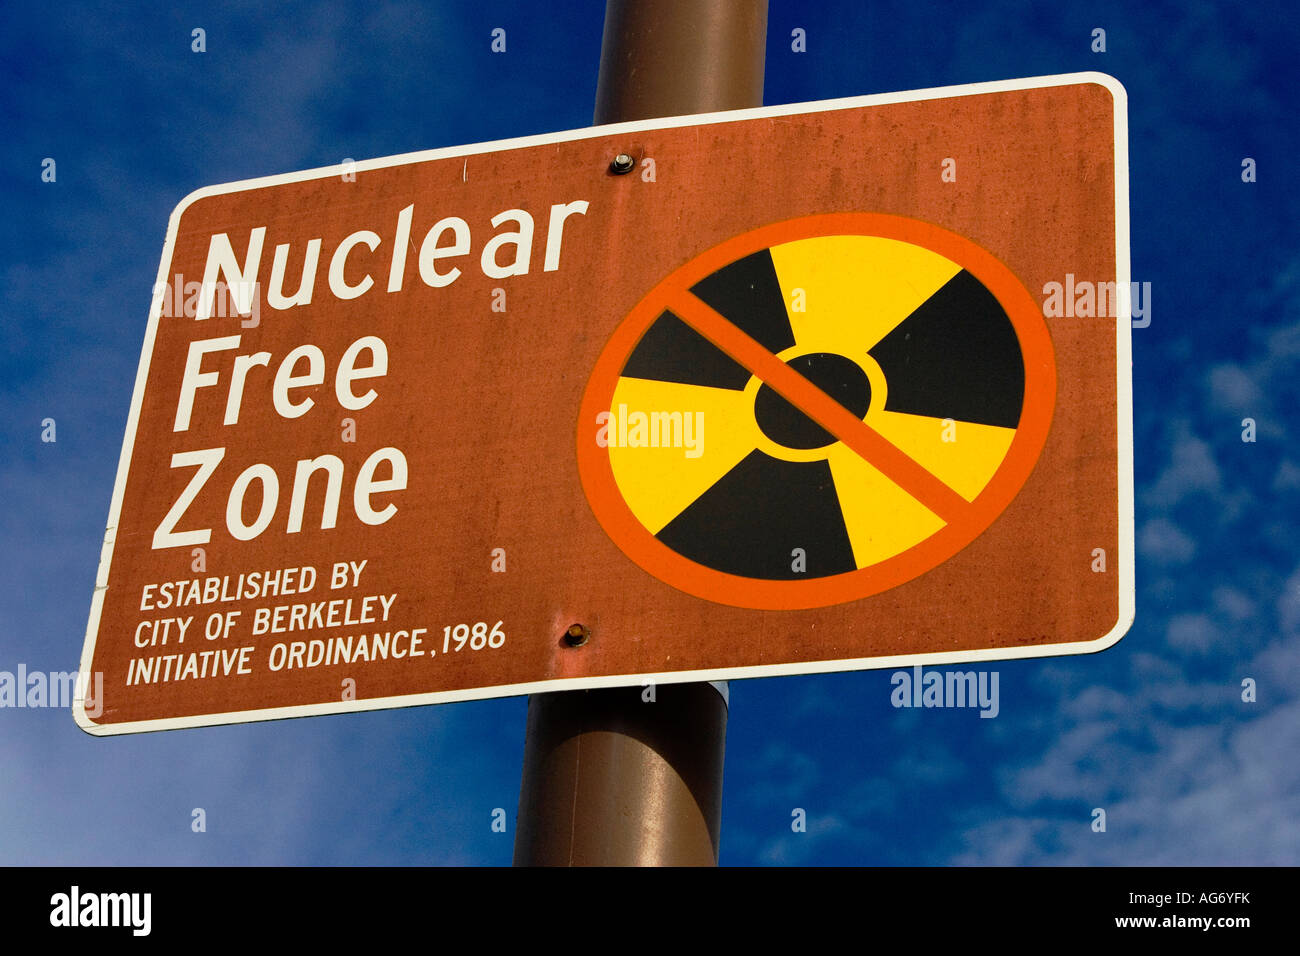 Berkeley California Nuclear Free Zone sign - Stock Image